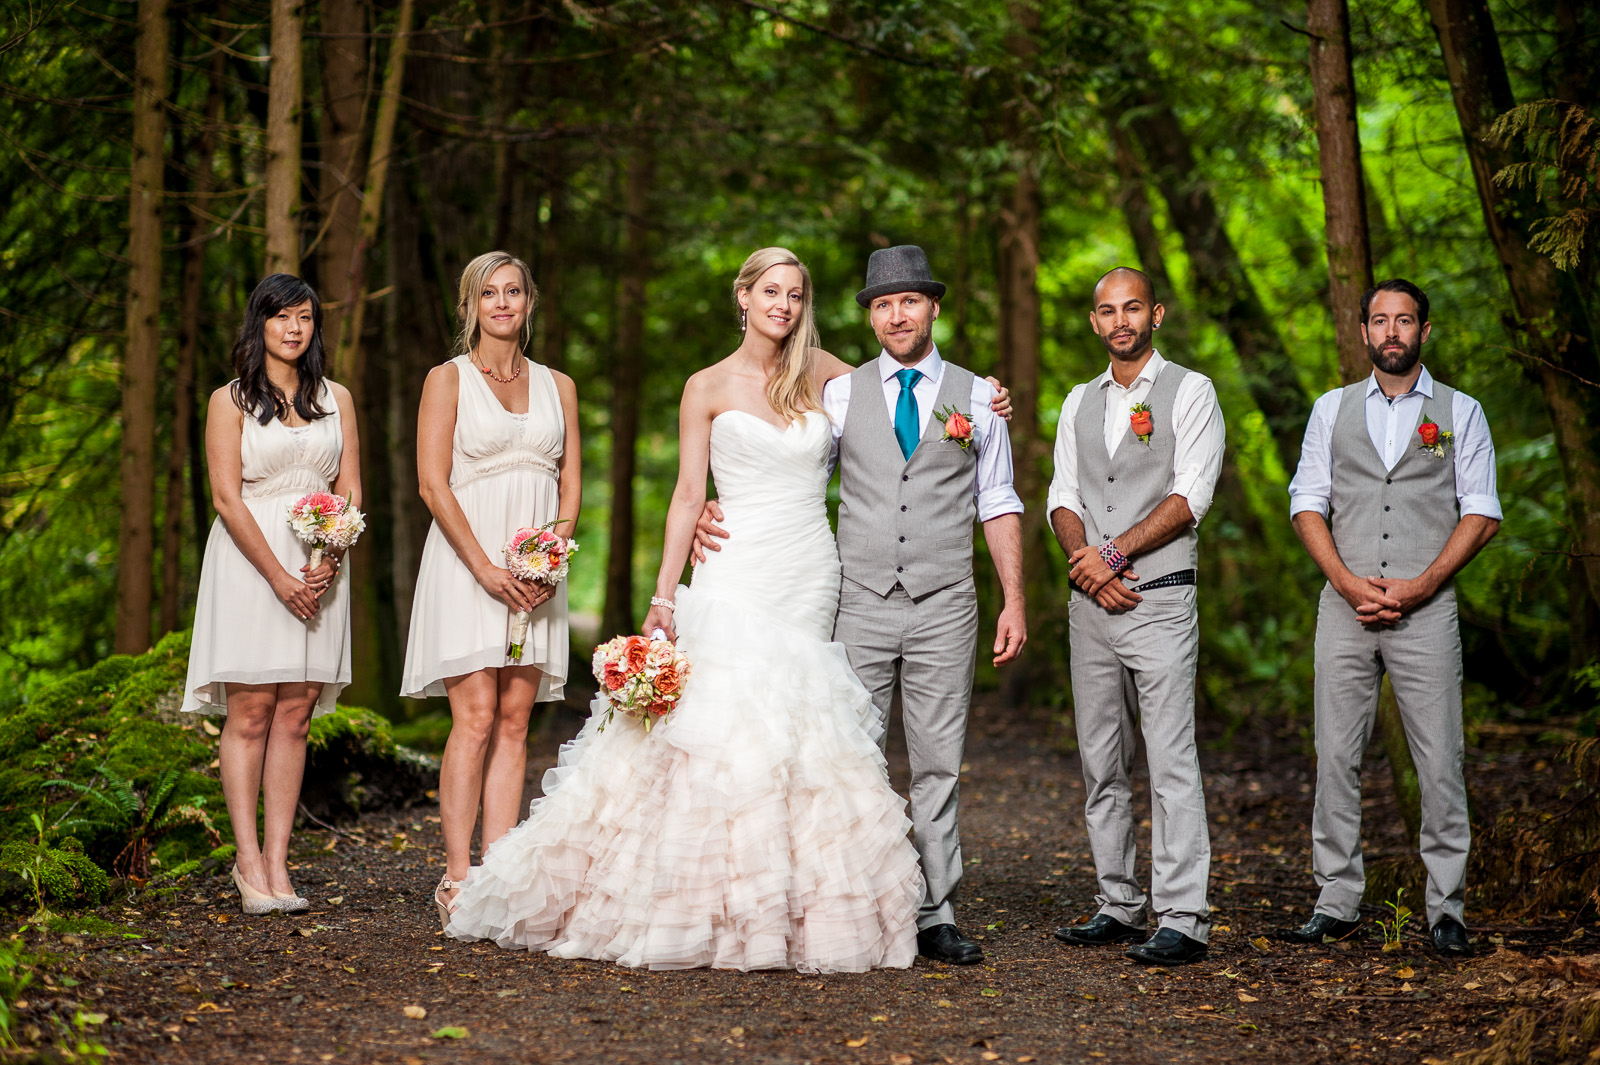 bc-wedding-photographers-cleveland-dam-wedding-20.jpg